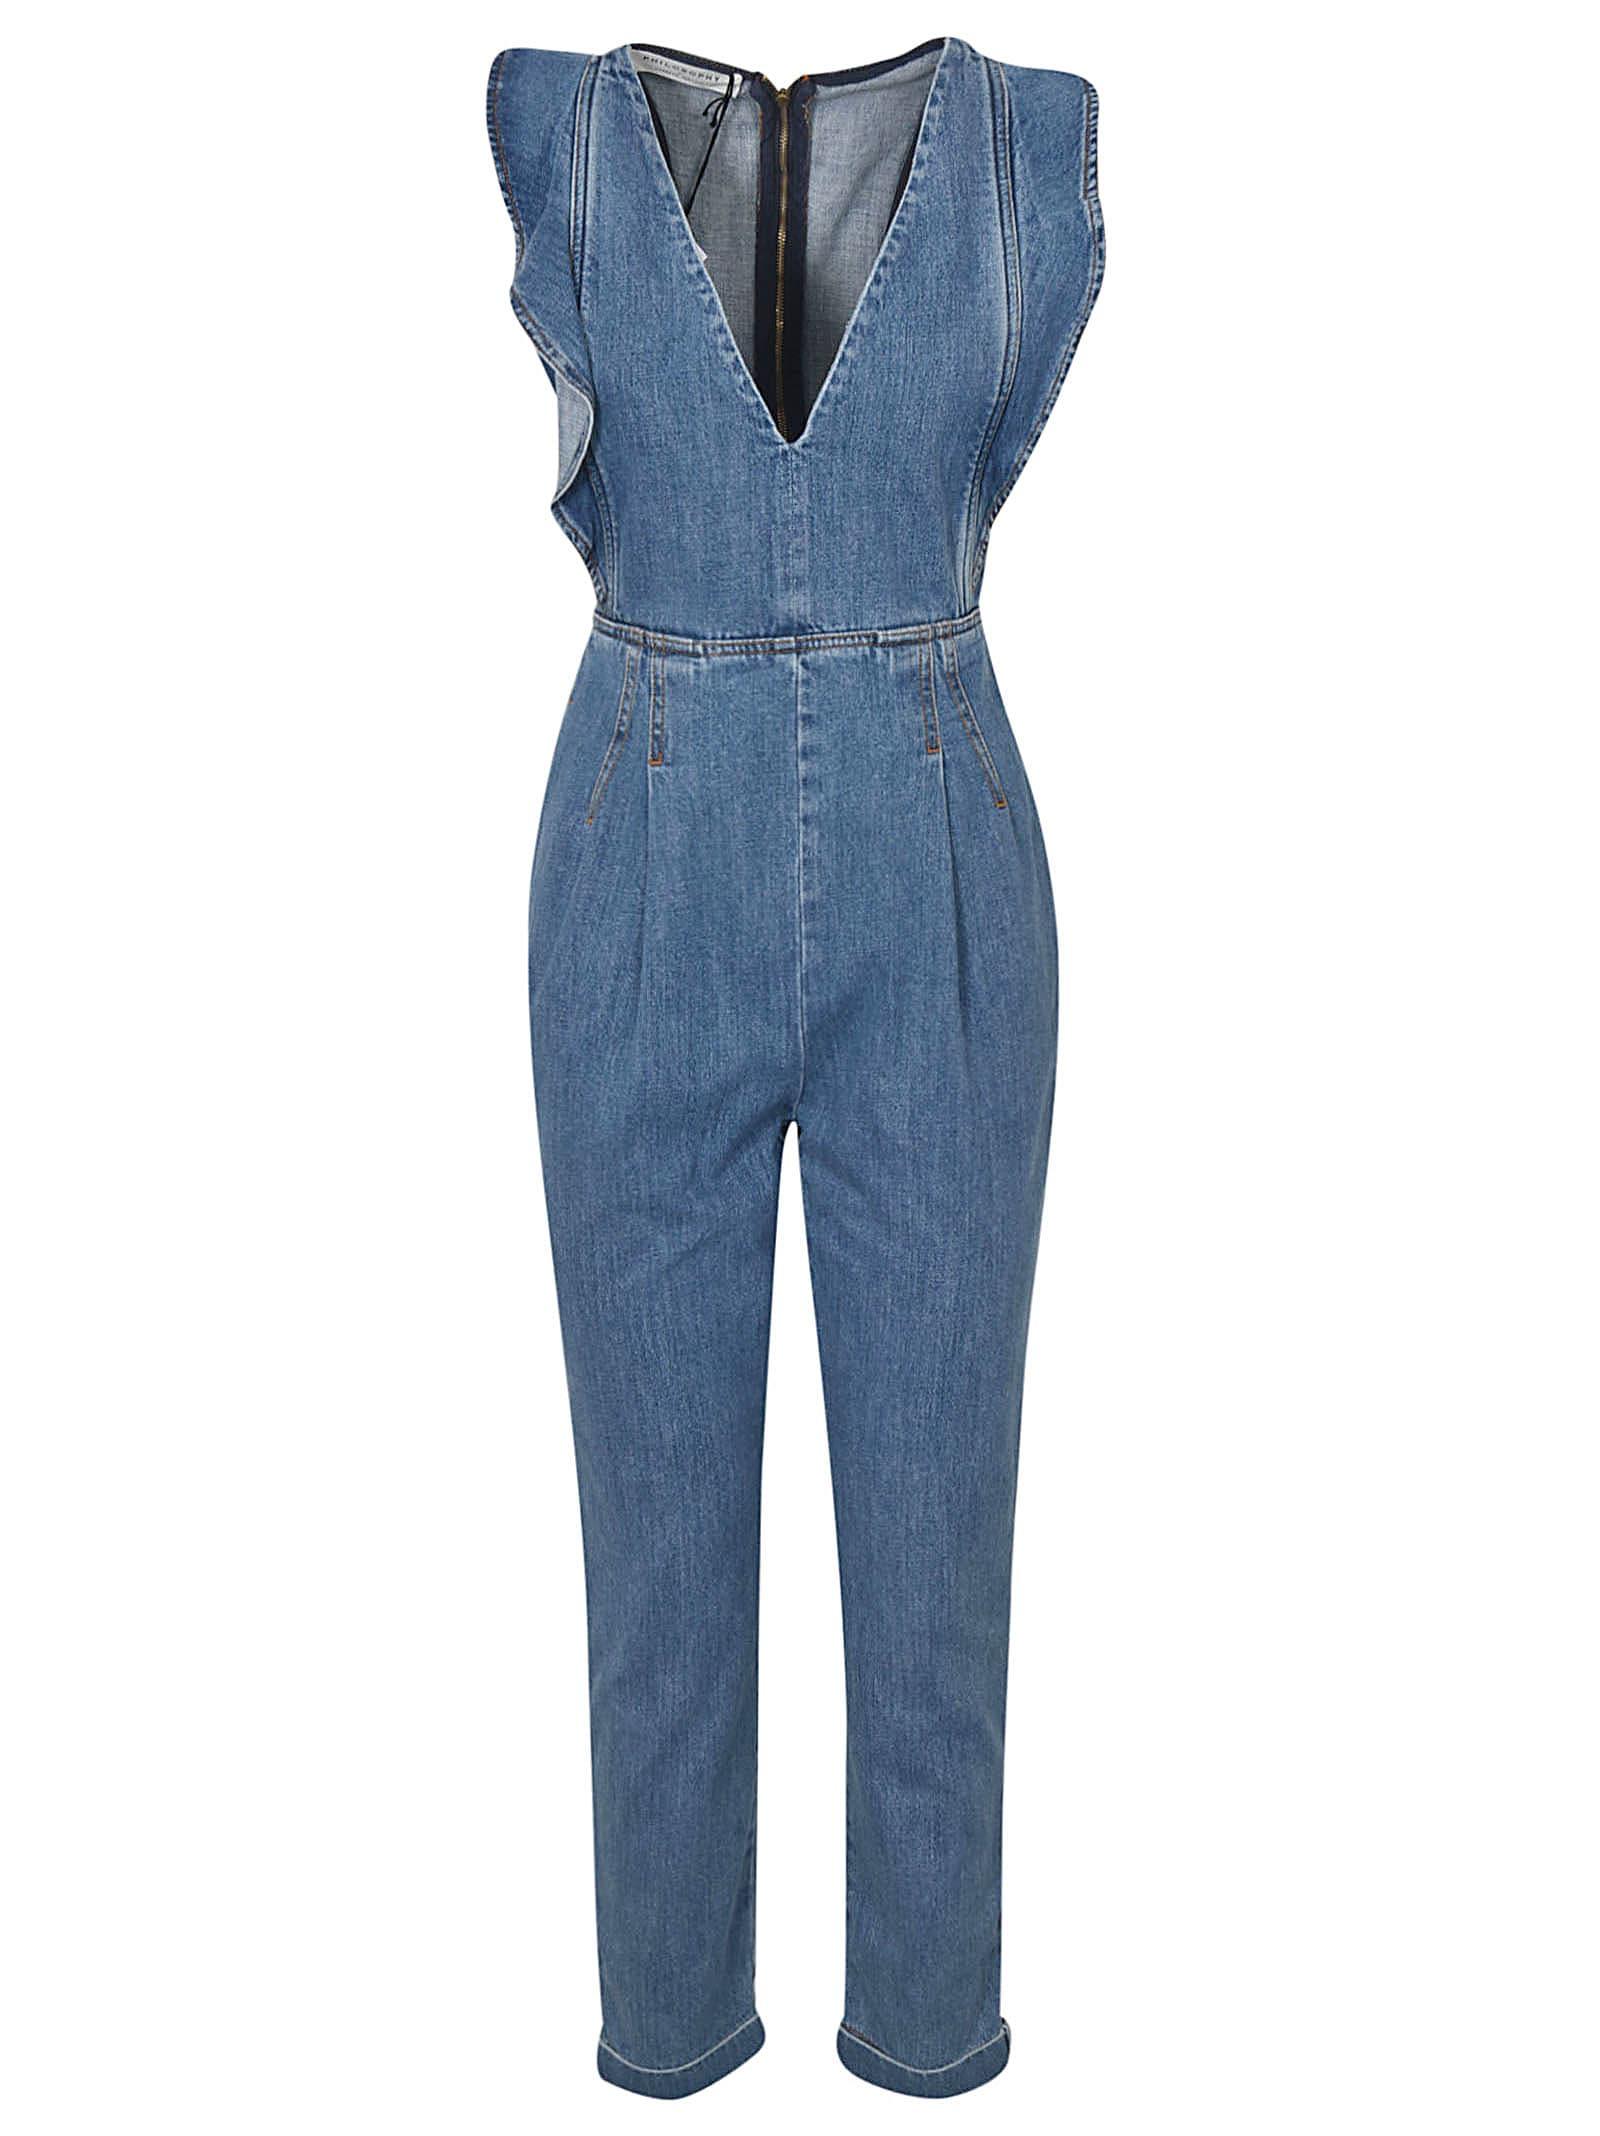 Buy Philosophy di Lorenzo Serafini V-neck Denim Dress online, shop Philosophy di Lorenzo Serafini with free shipping